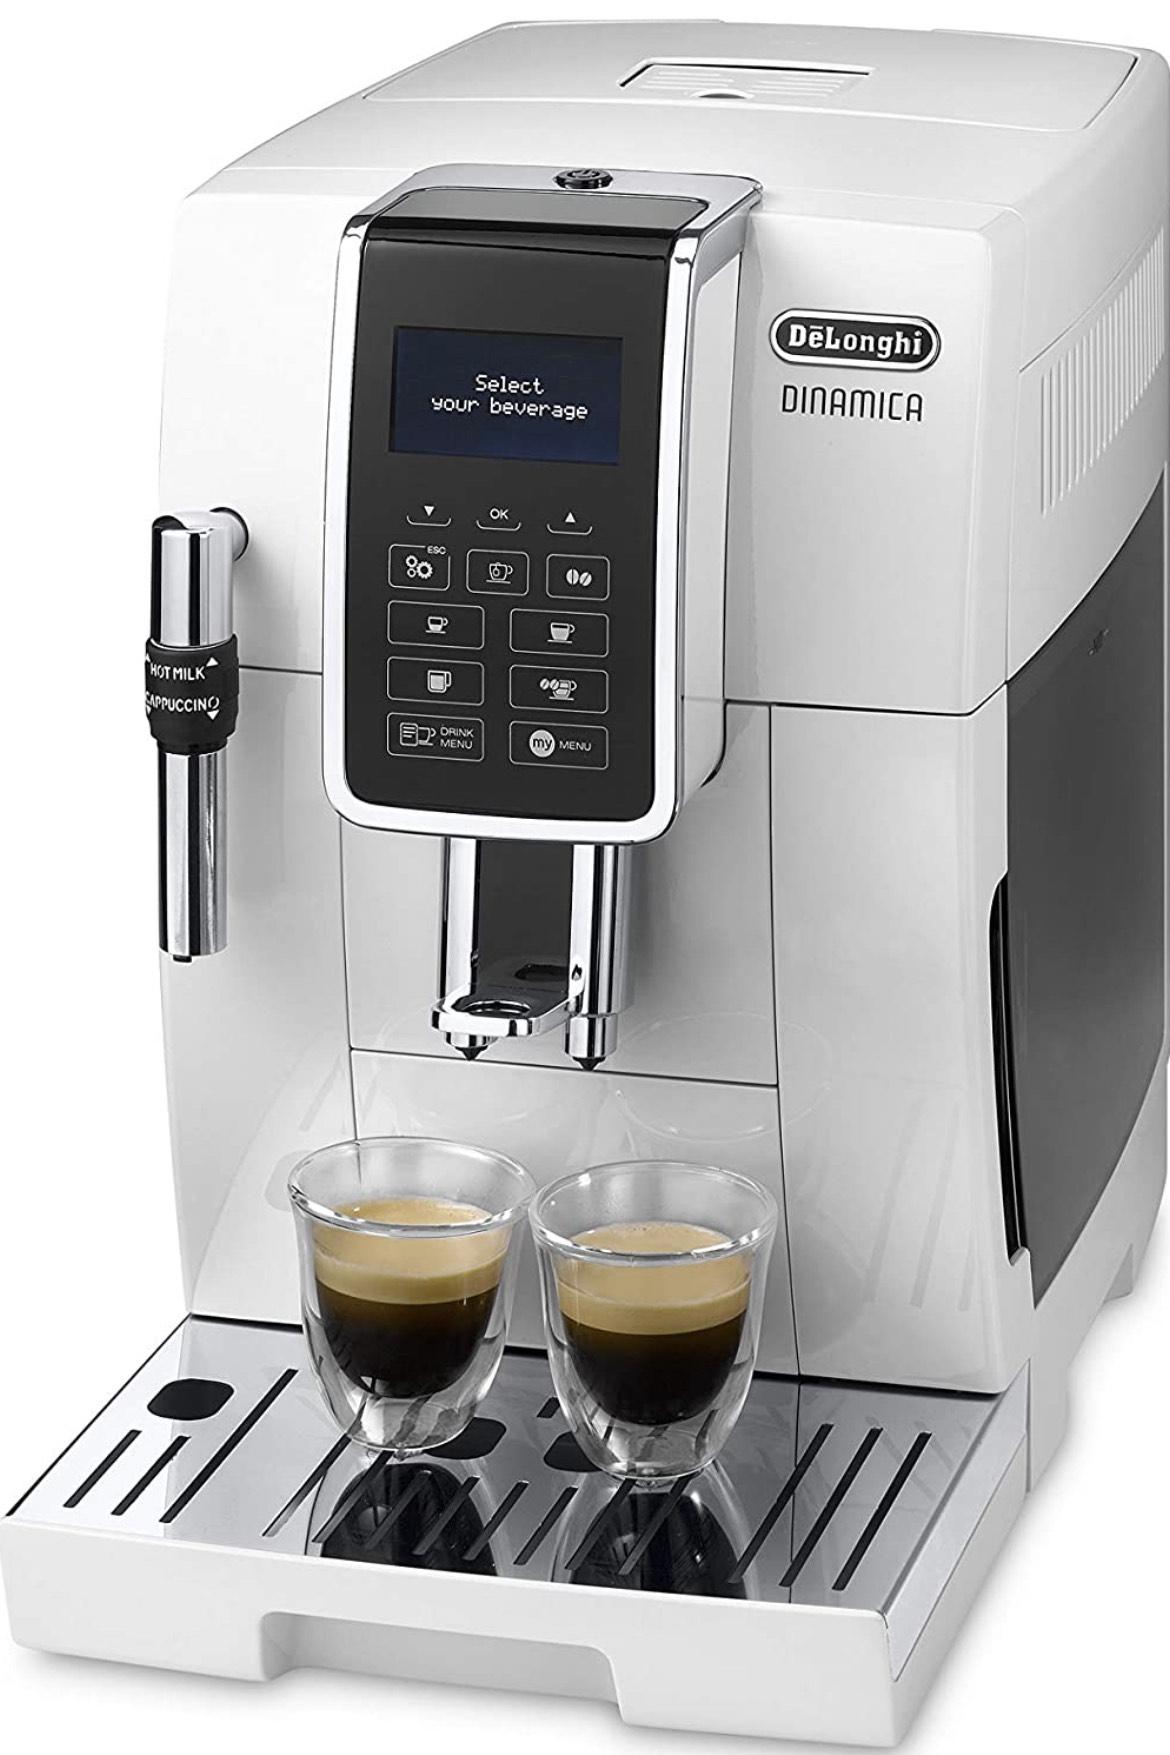 Machine expresso avec broyeur De'Longhi Dinamica Ecam 350.35